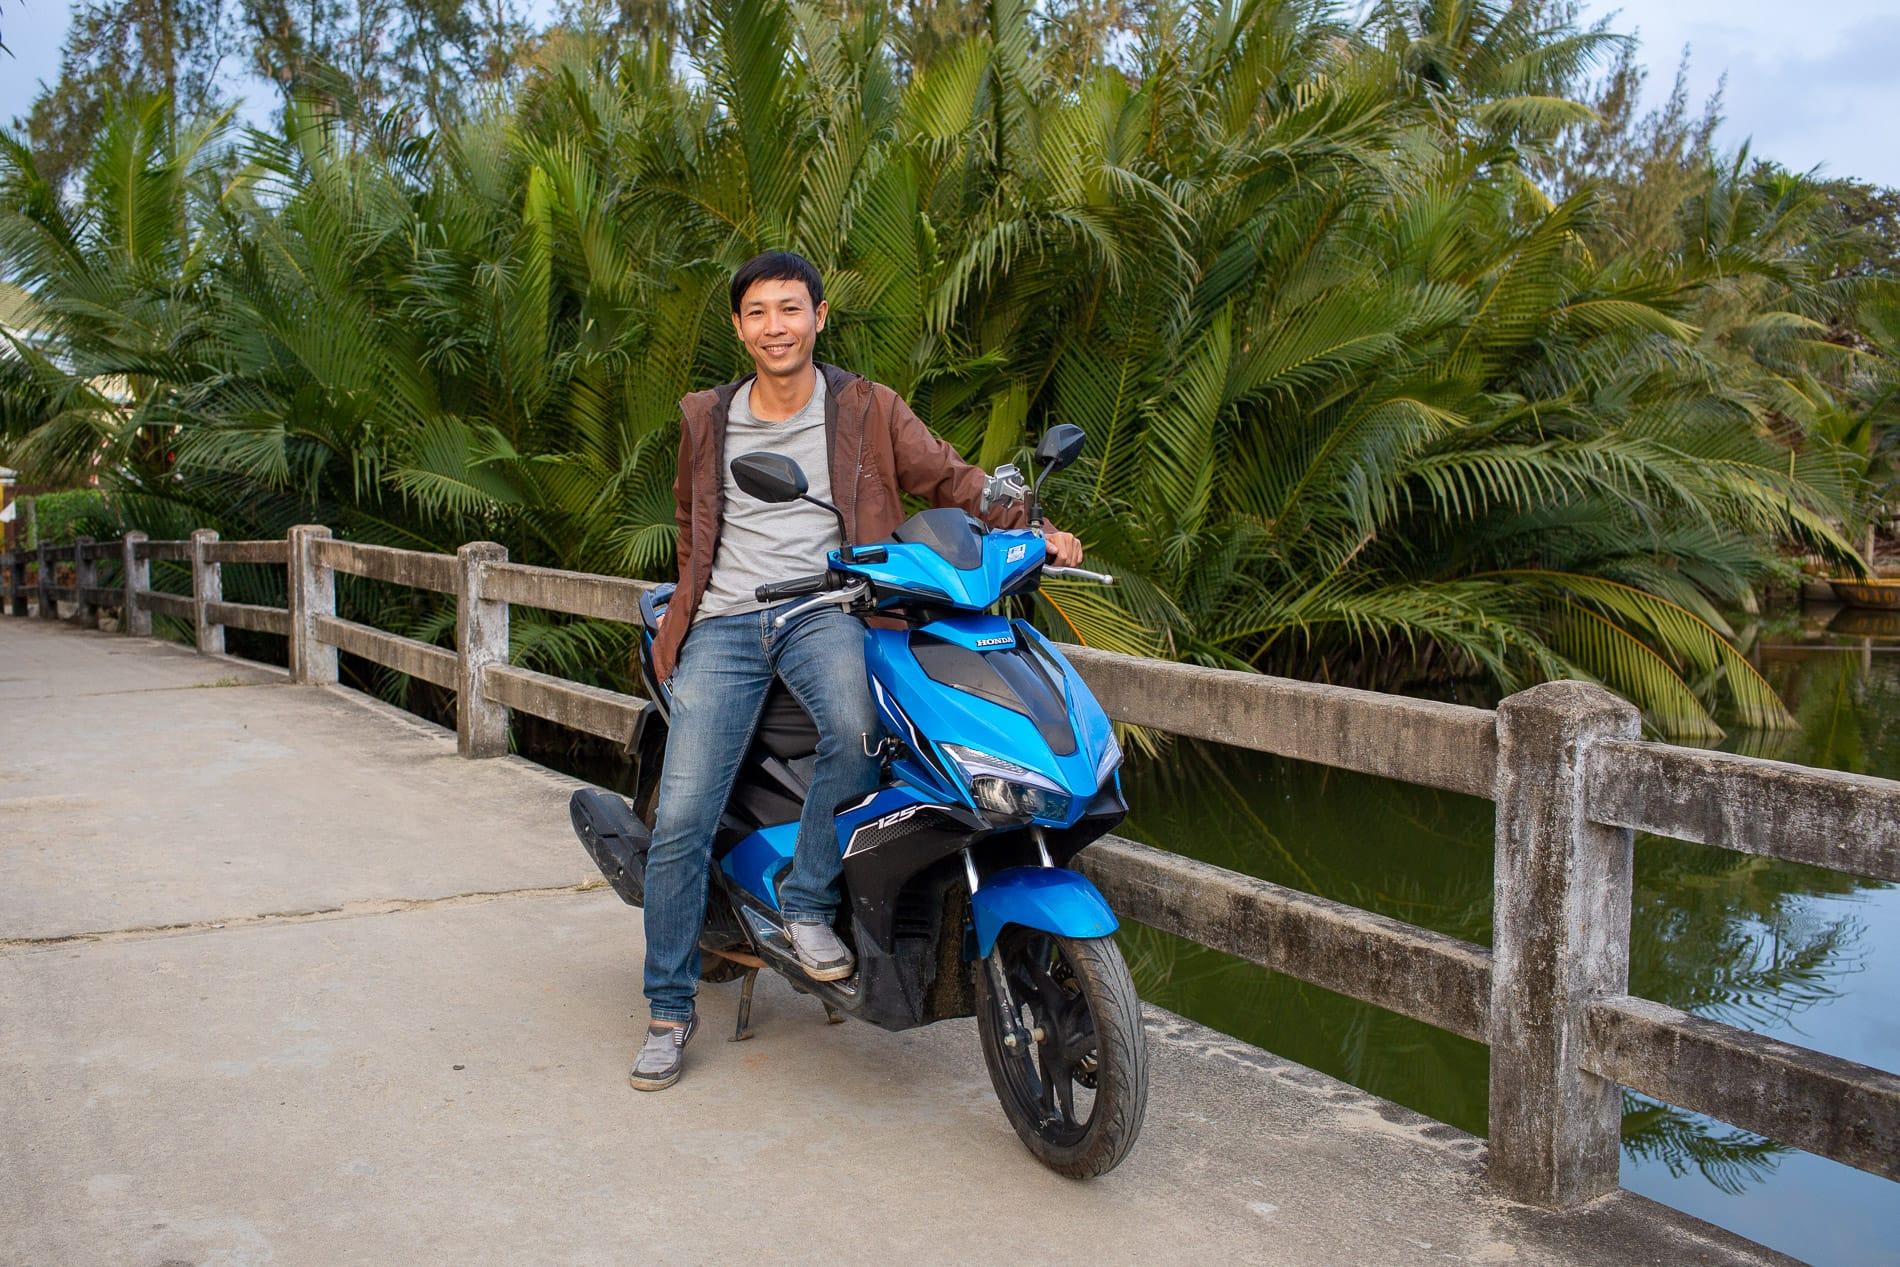 Hoi An bike Rental company